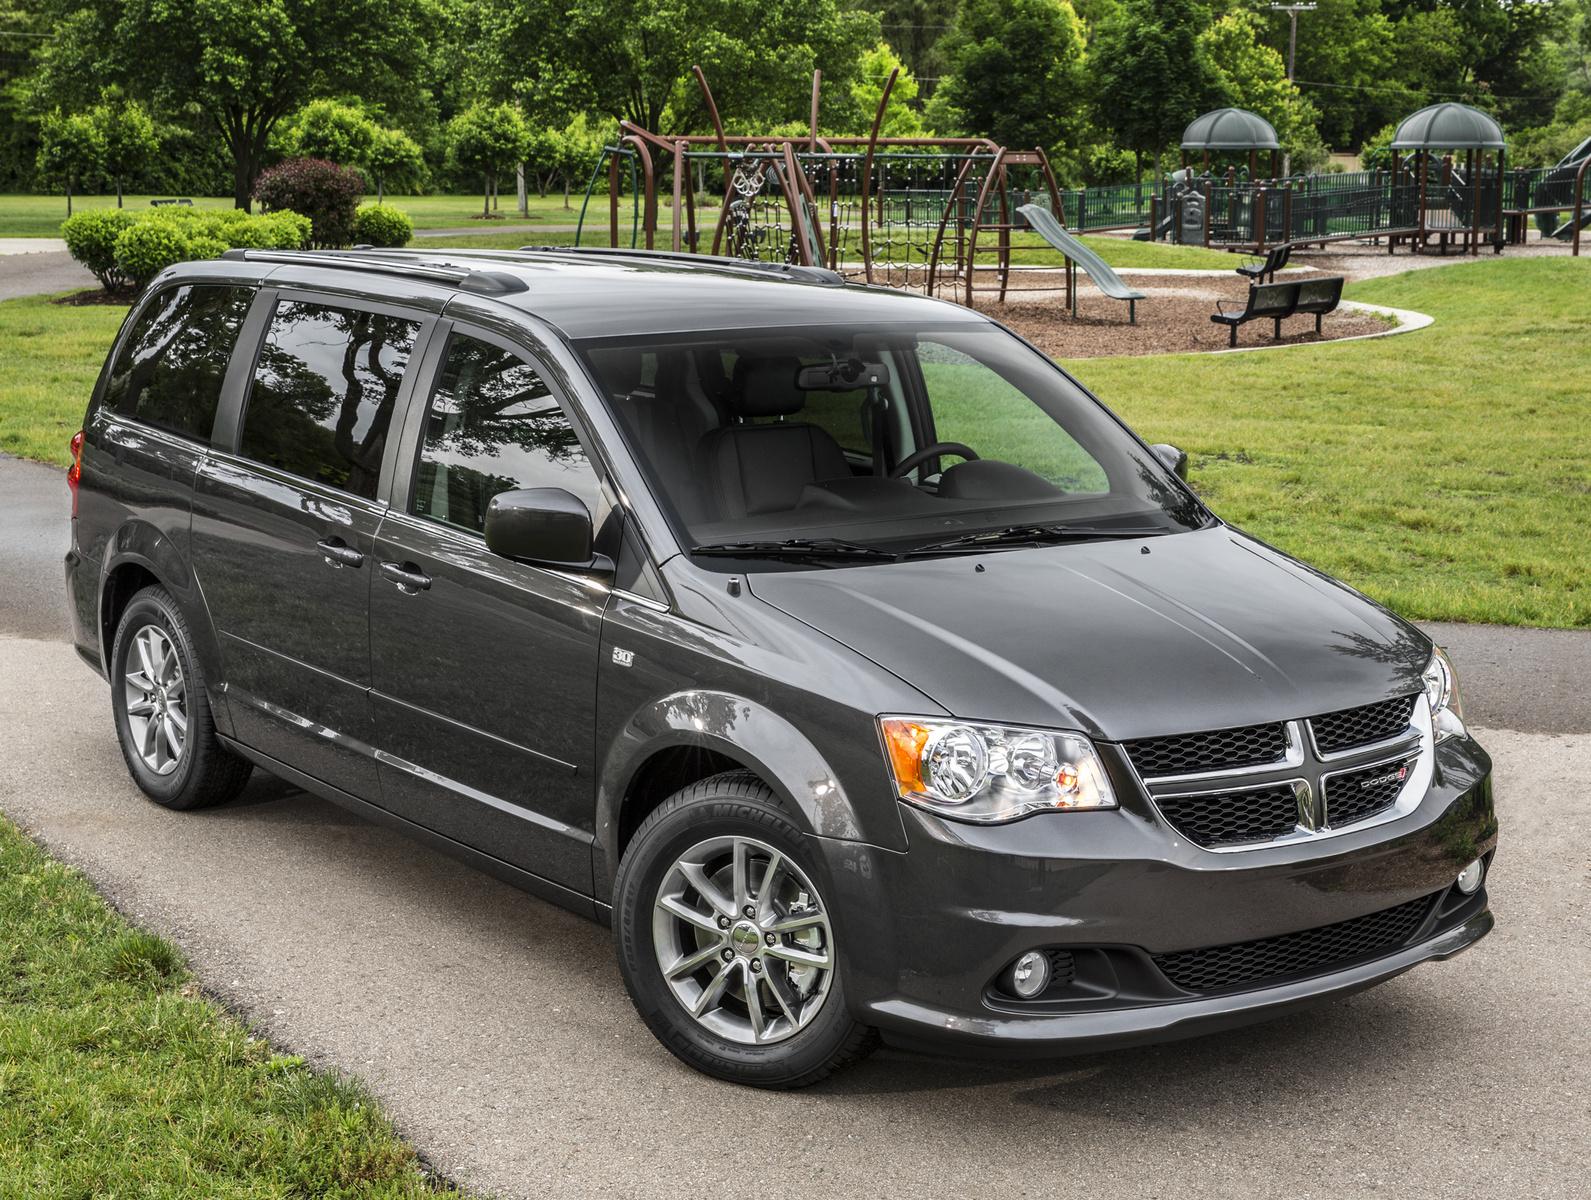 Grand Caravan Dodge Custom T 2012 Trailer Wiring Harness Installation 2015 Video Etrailercom